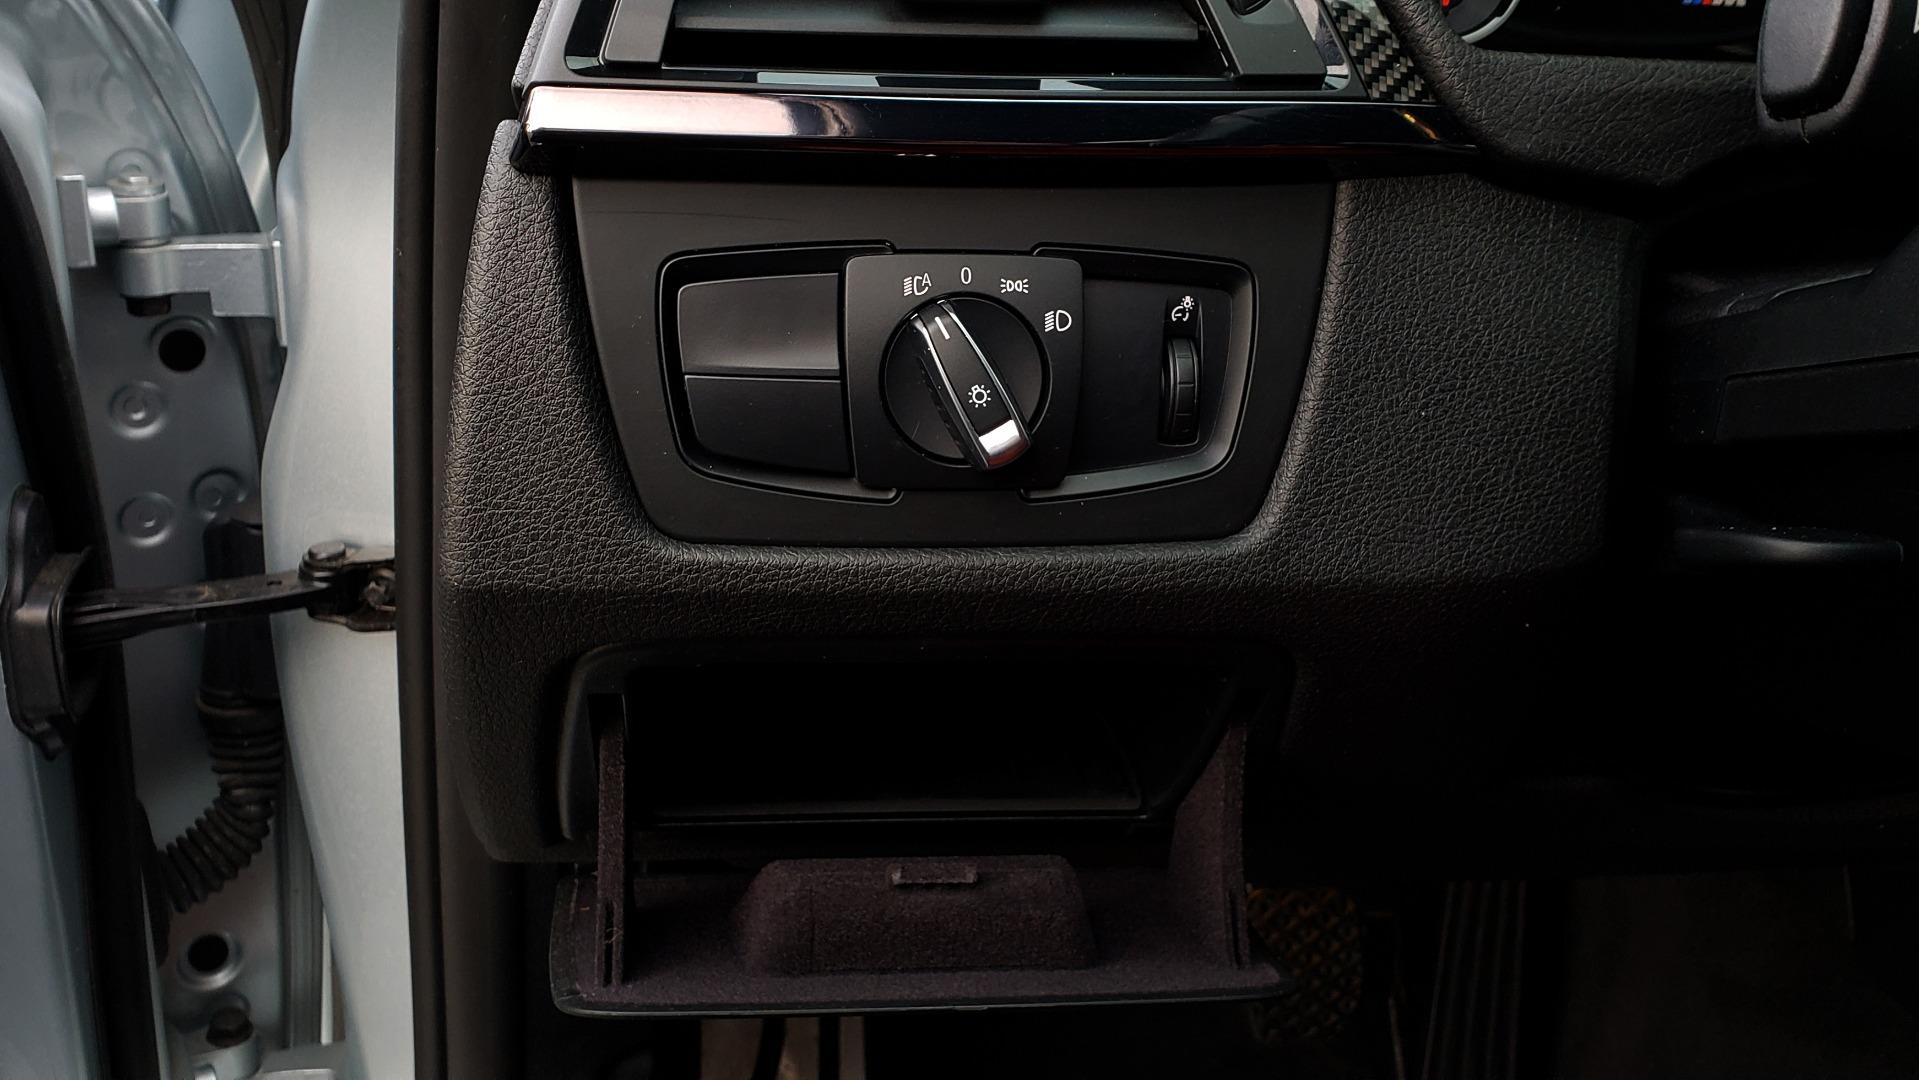 Used 2015 BMW M3 EXECUTIVE PKG / NAV / CAMERA / HUD / CARBON FIBER ROOF for sale Sold at Formula Imports in Charlotte NC 28227 55